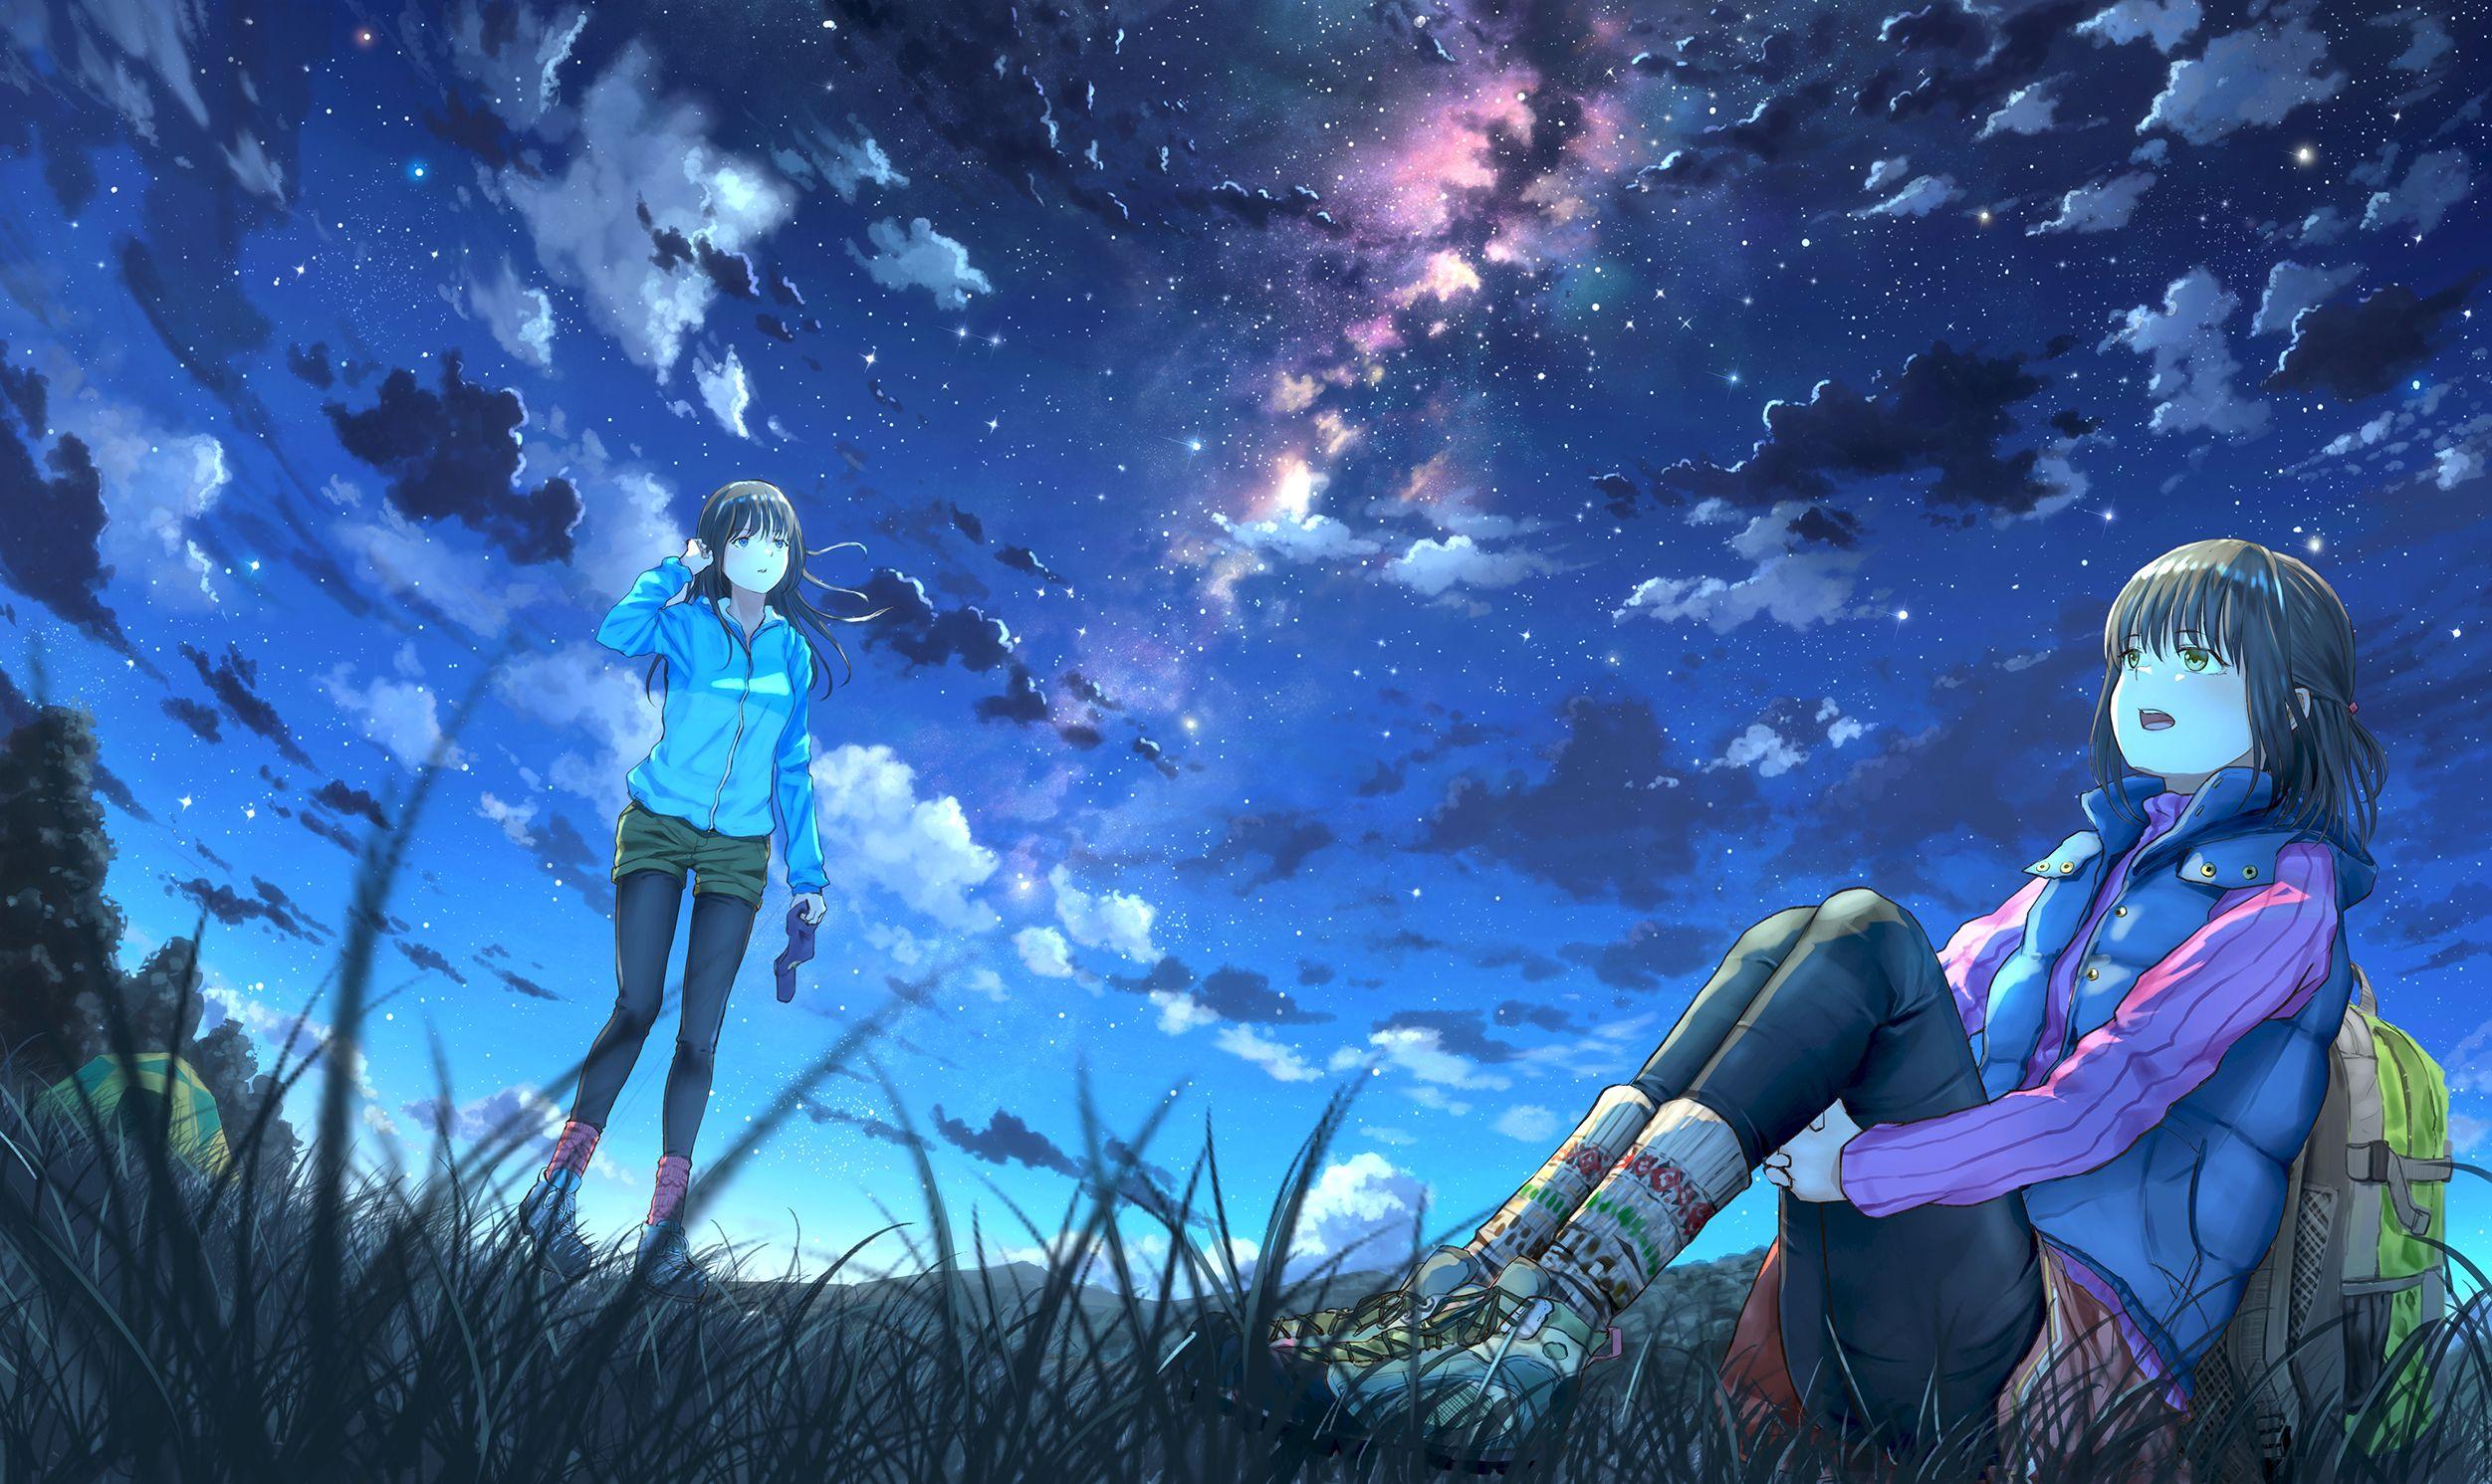 Anime 2503x1491 Sky Anime Night Anime Girls Stars Sky Anime Anime Scenery Superhero Wallpaper